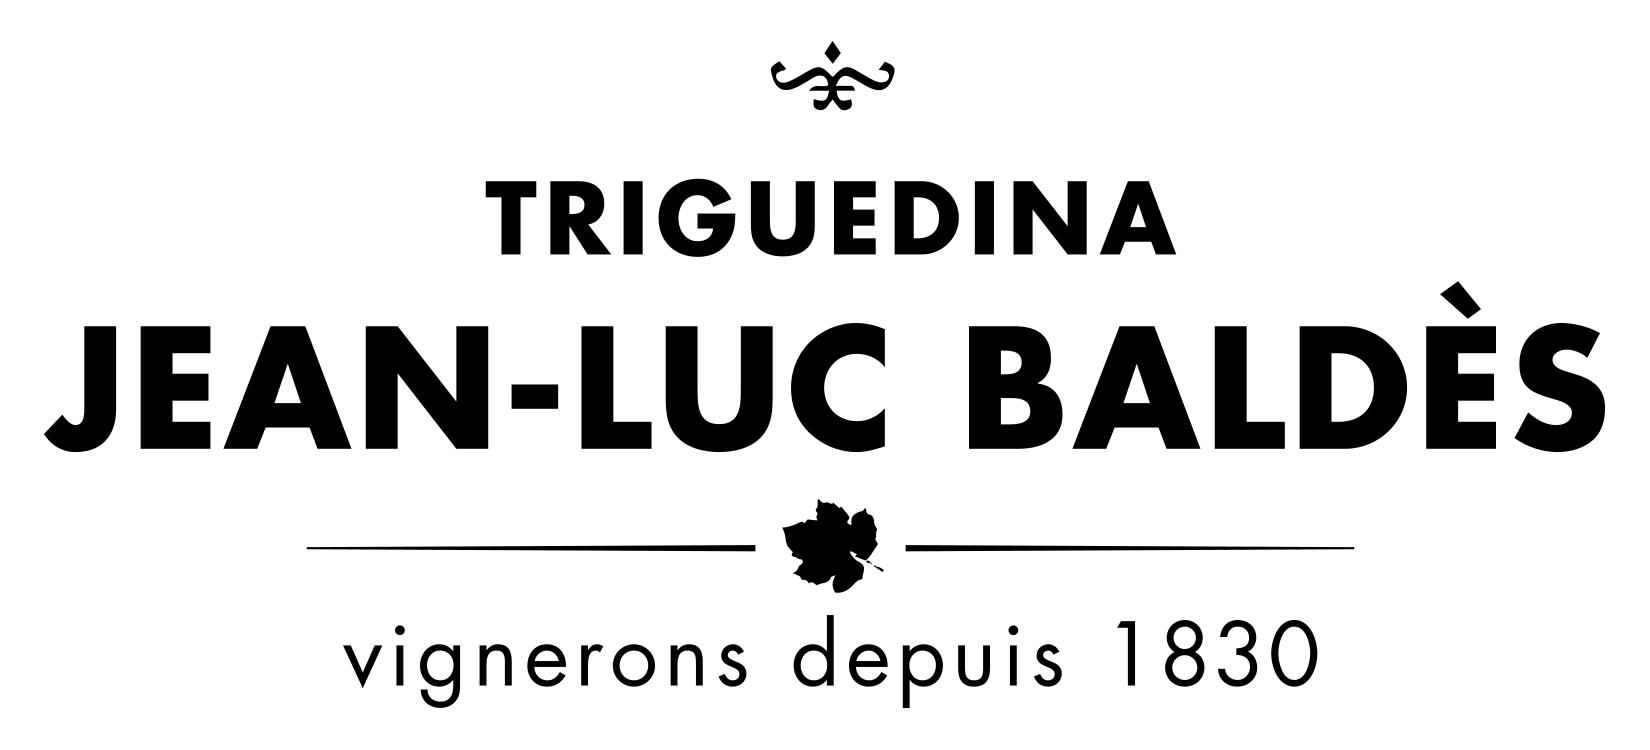 Triguedina Logo.jpg